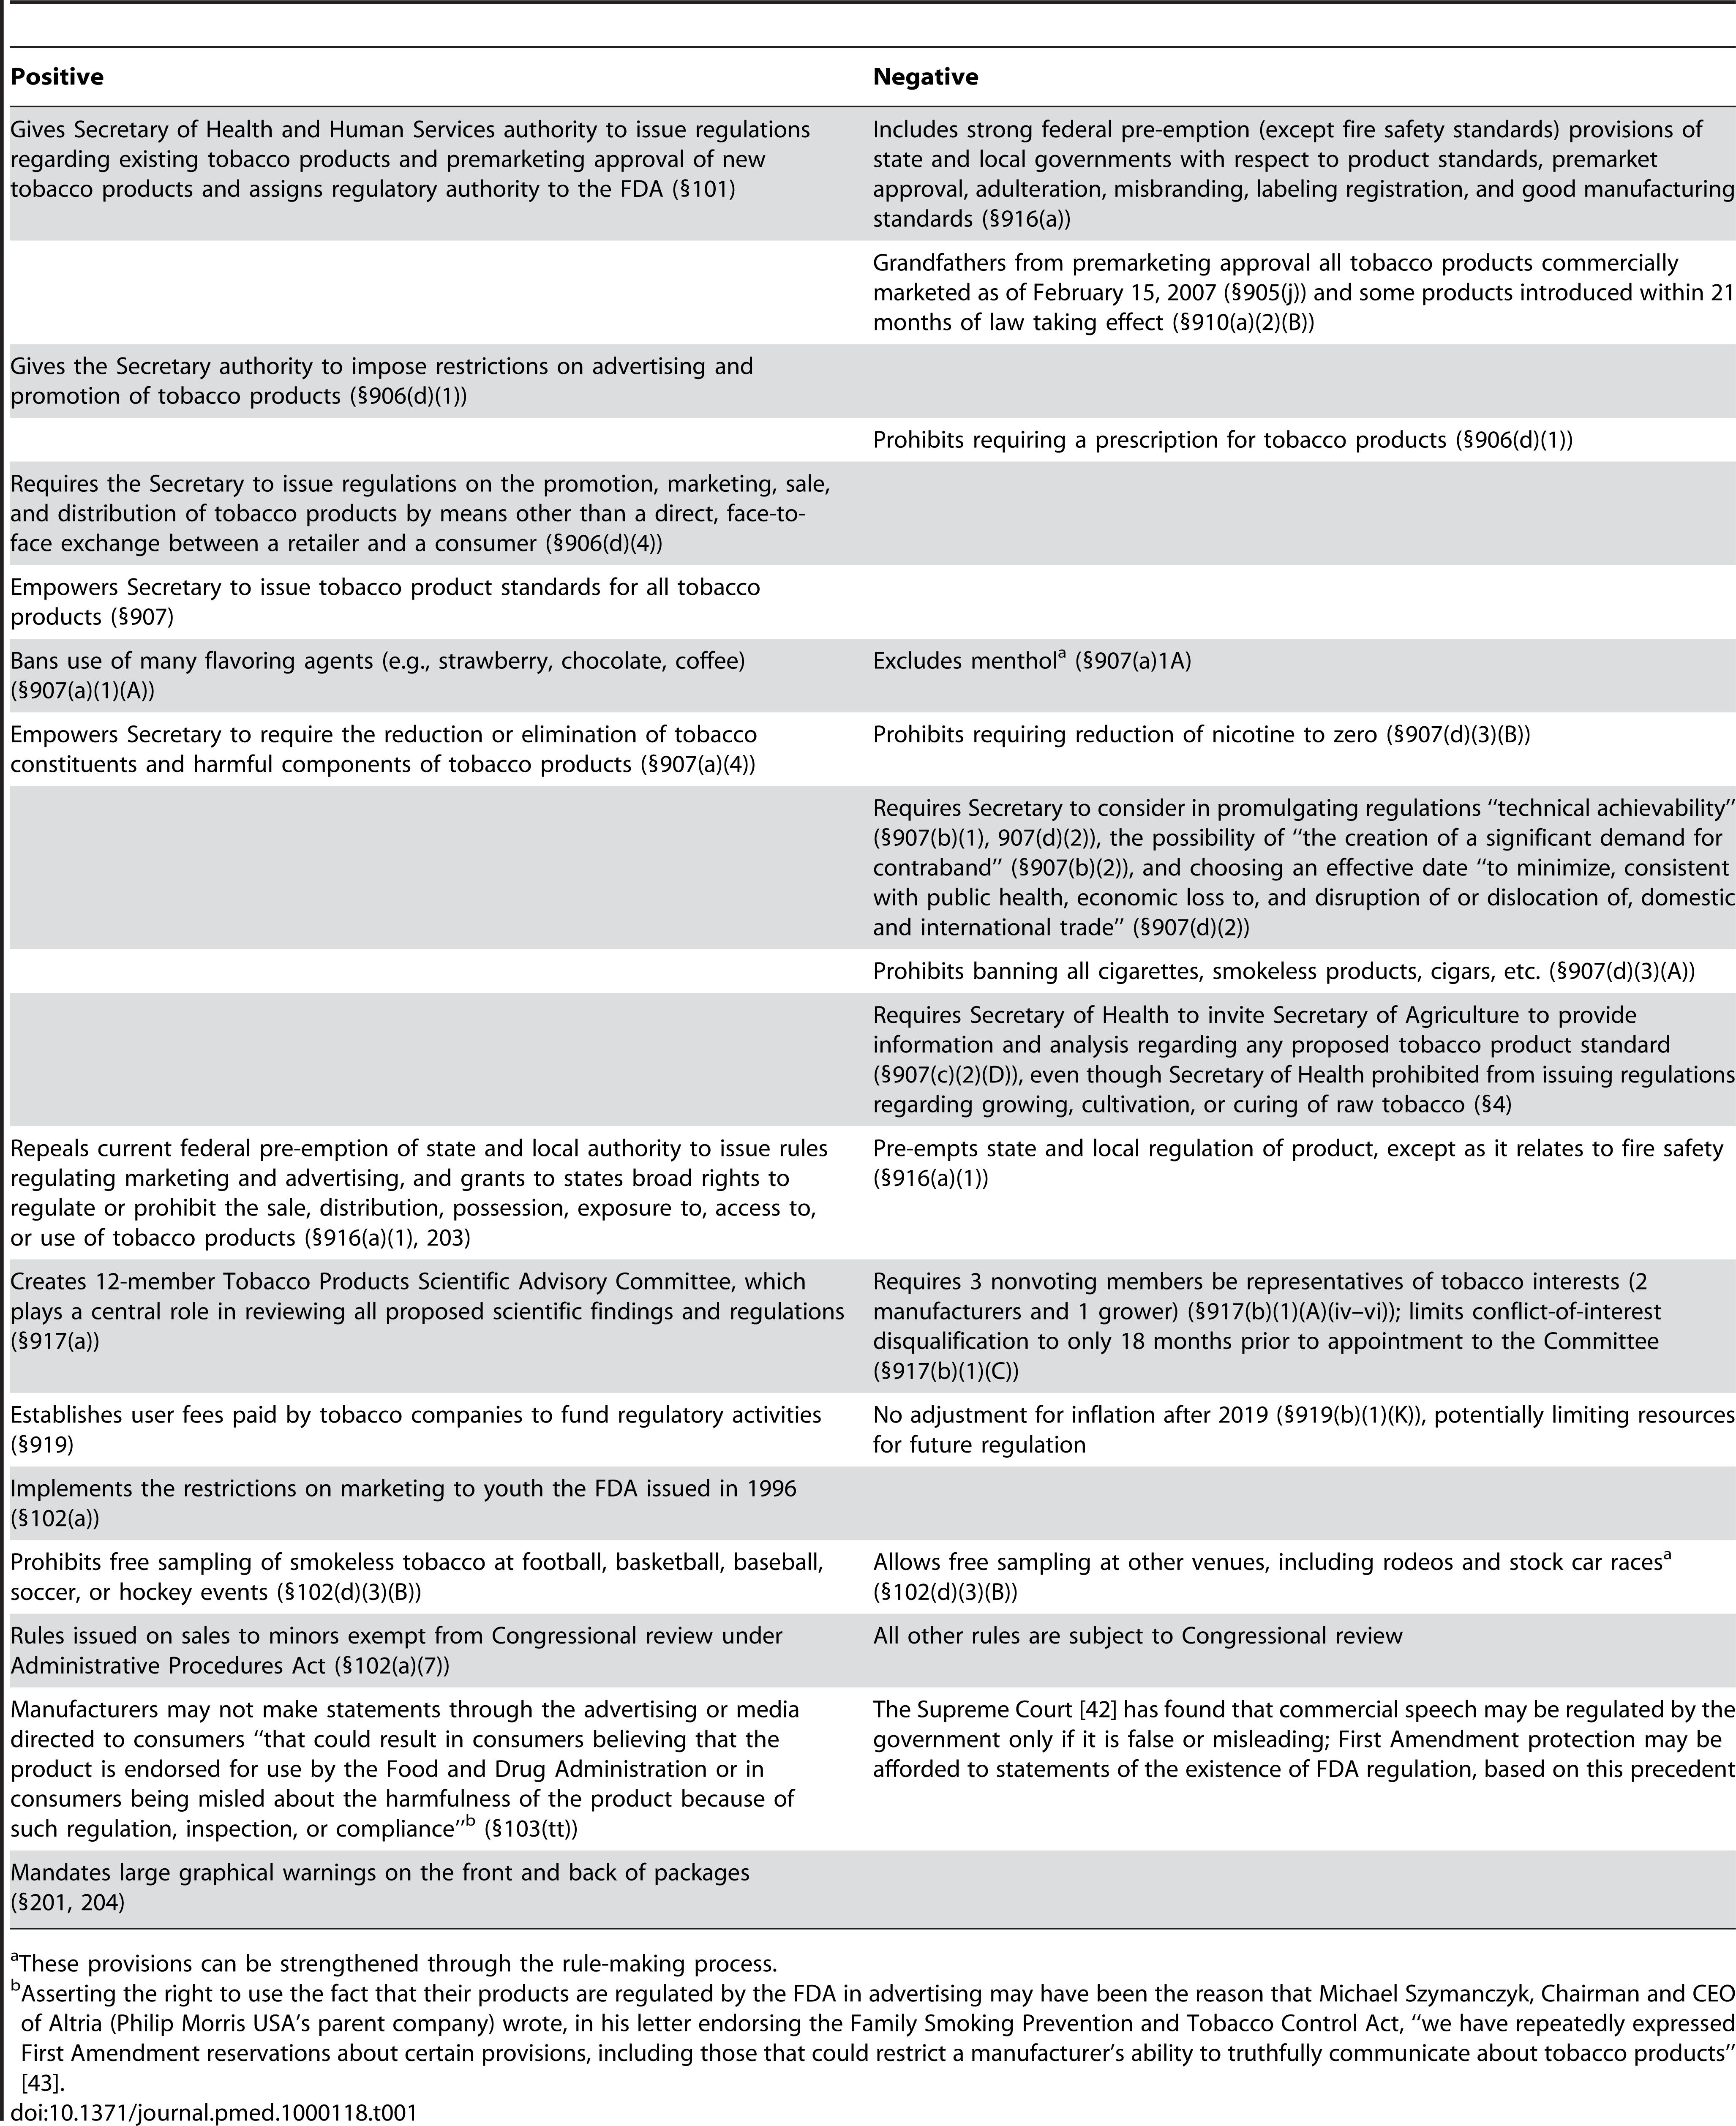 Major provisions of FDA law (S. 982, June 12, 2009).